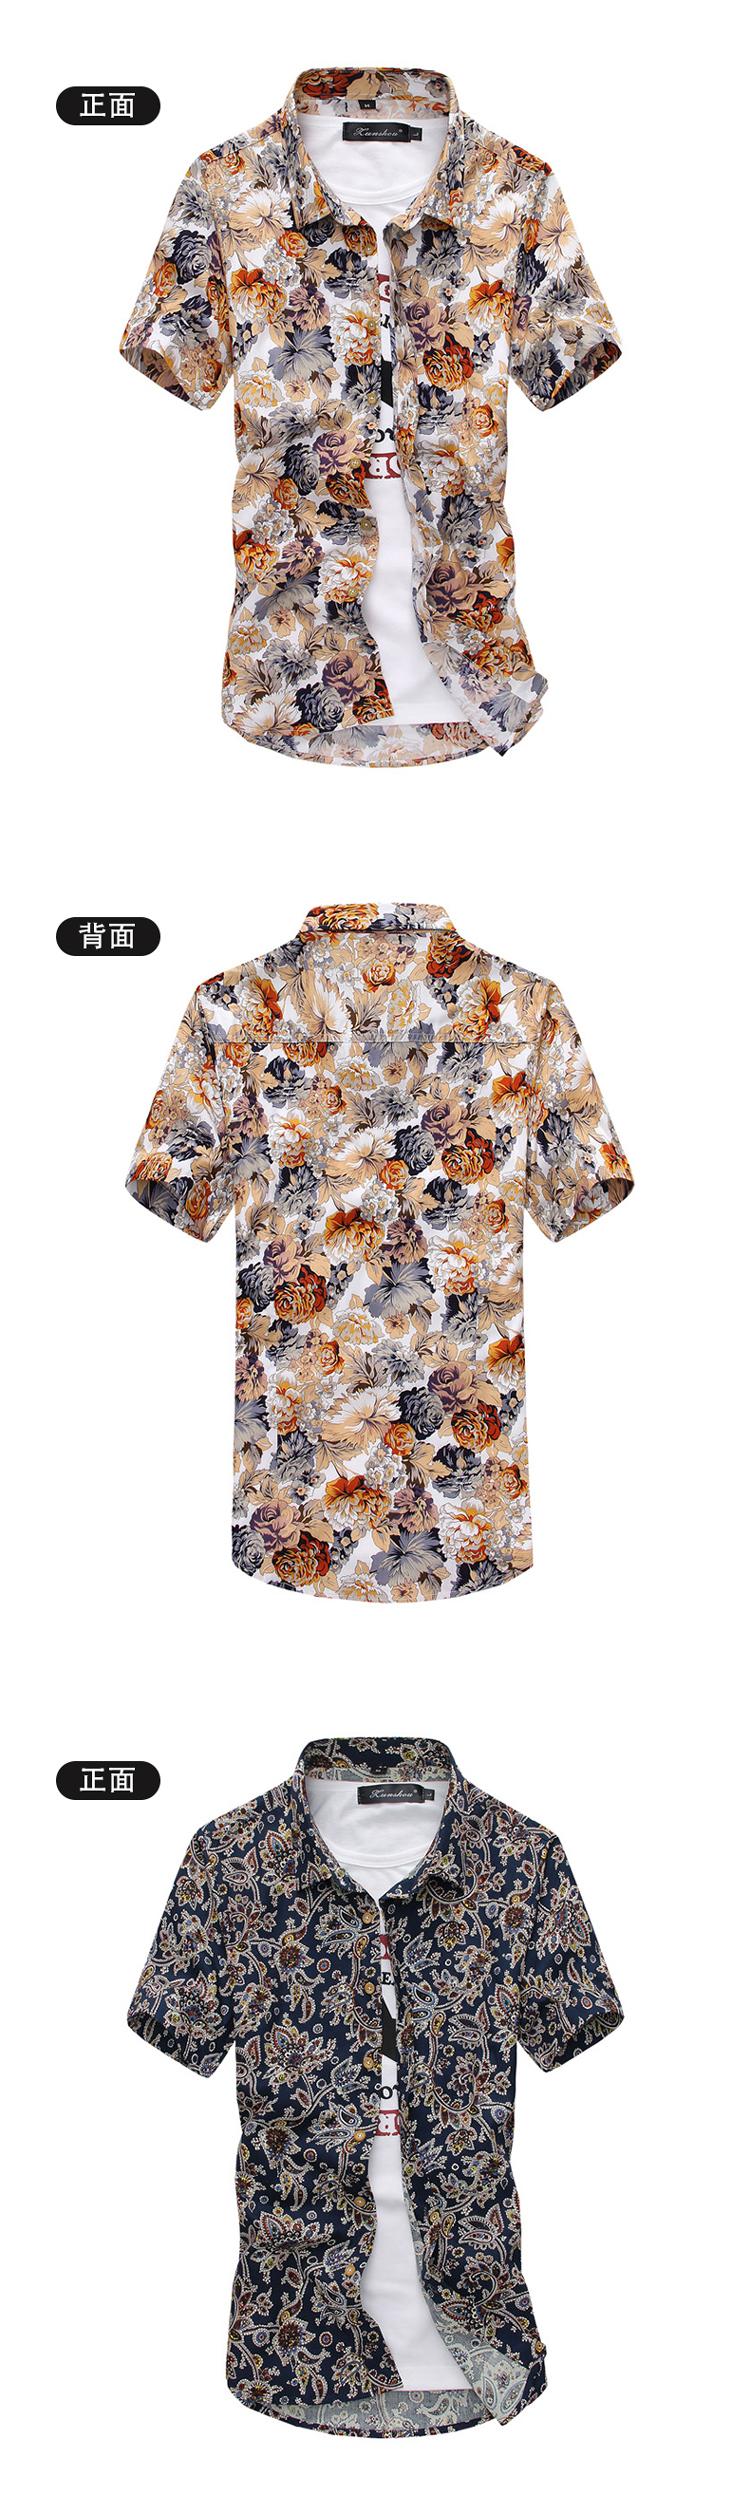 Men Summer Thin Shirts Short Sleeve Floral Shirts New Fashion Men Outwear Casual Slim Shirts Mens Cotton dress shirts 8 Online shopping Bangladesh